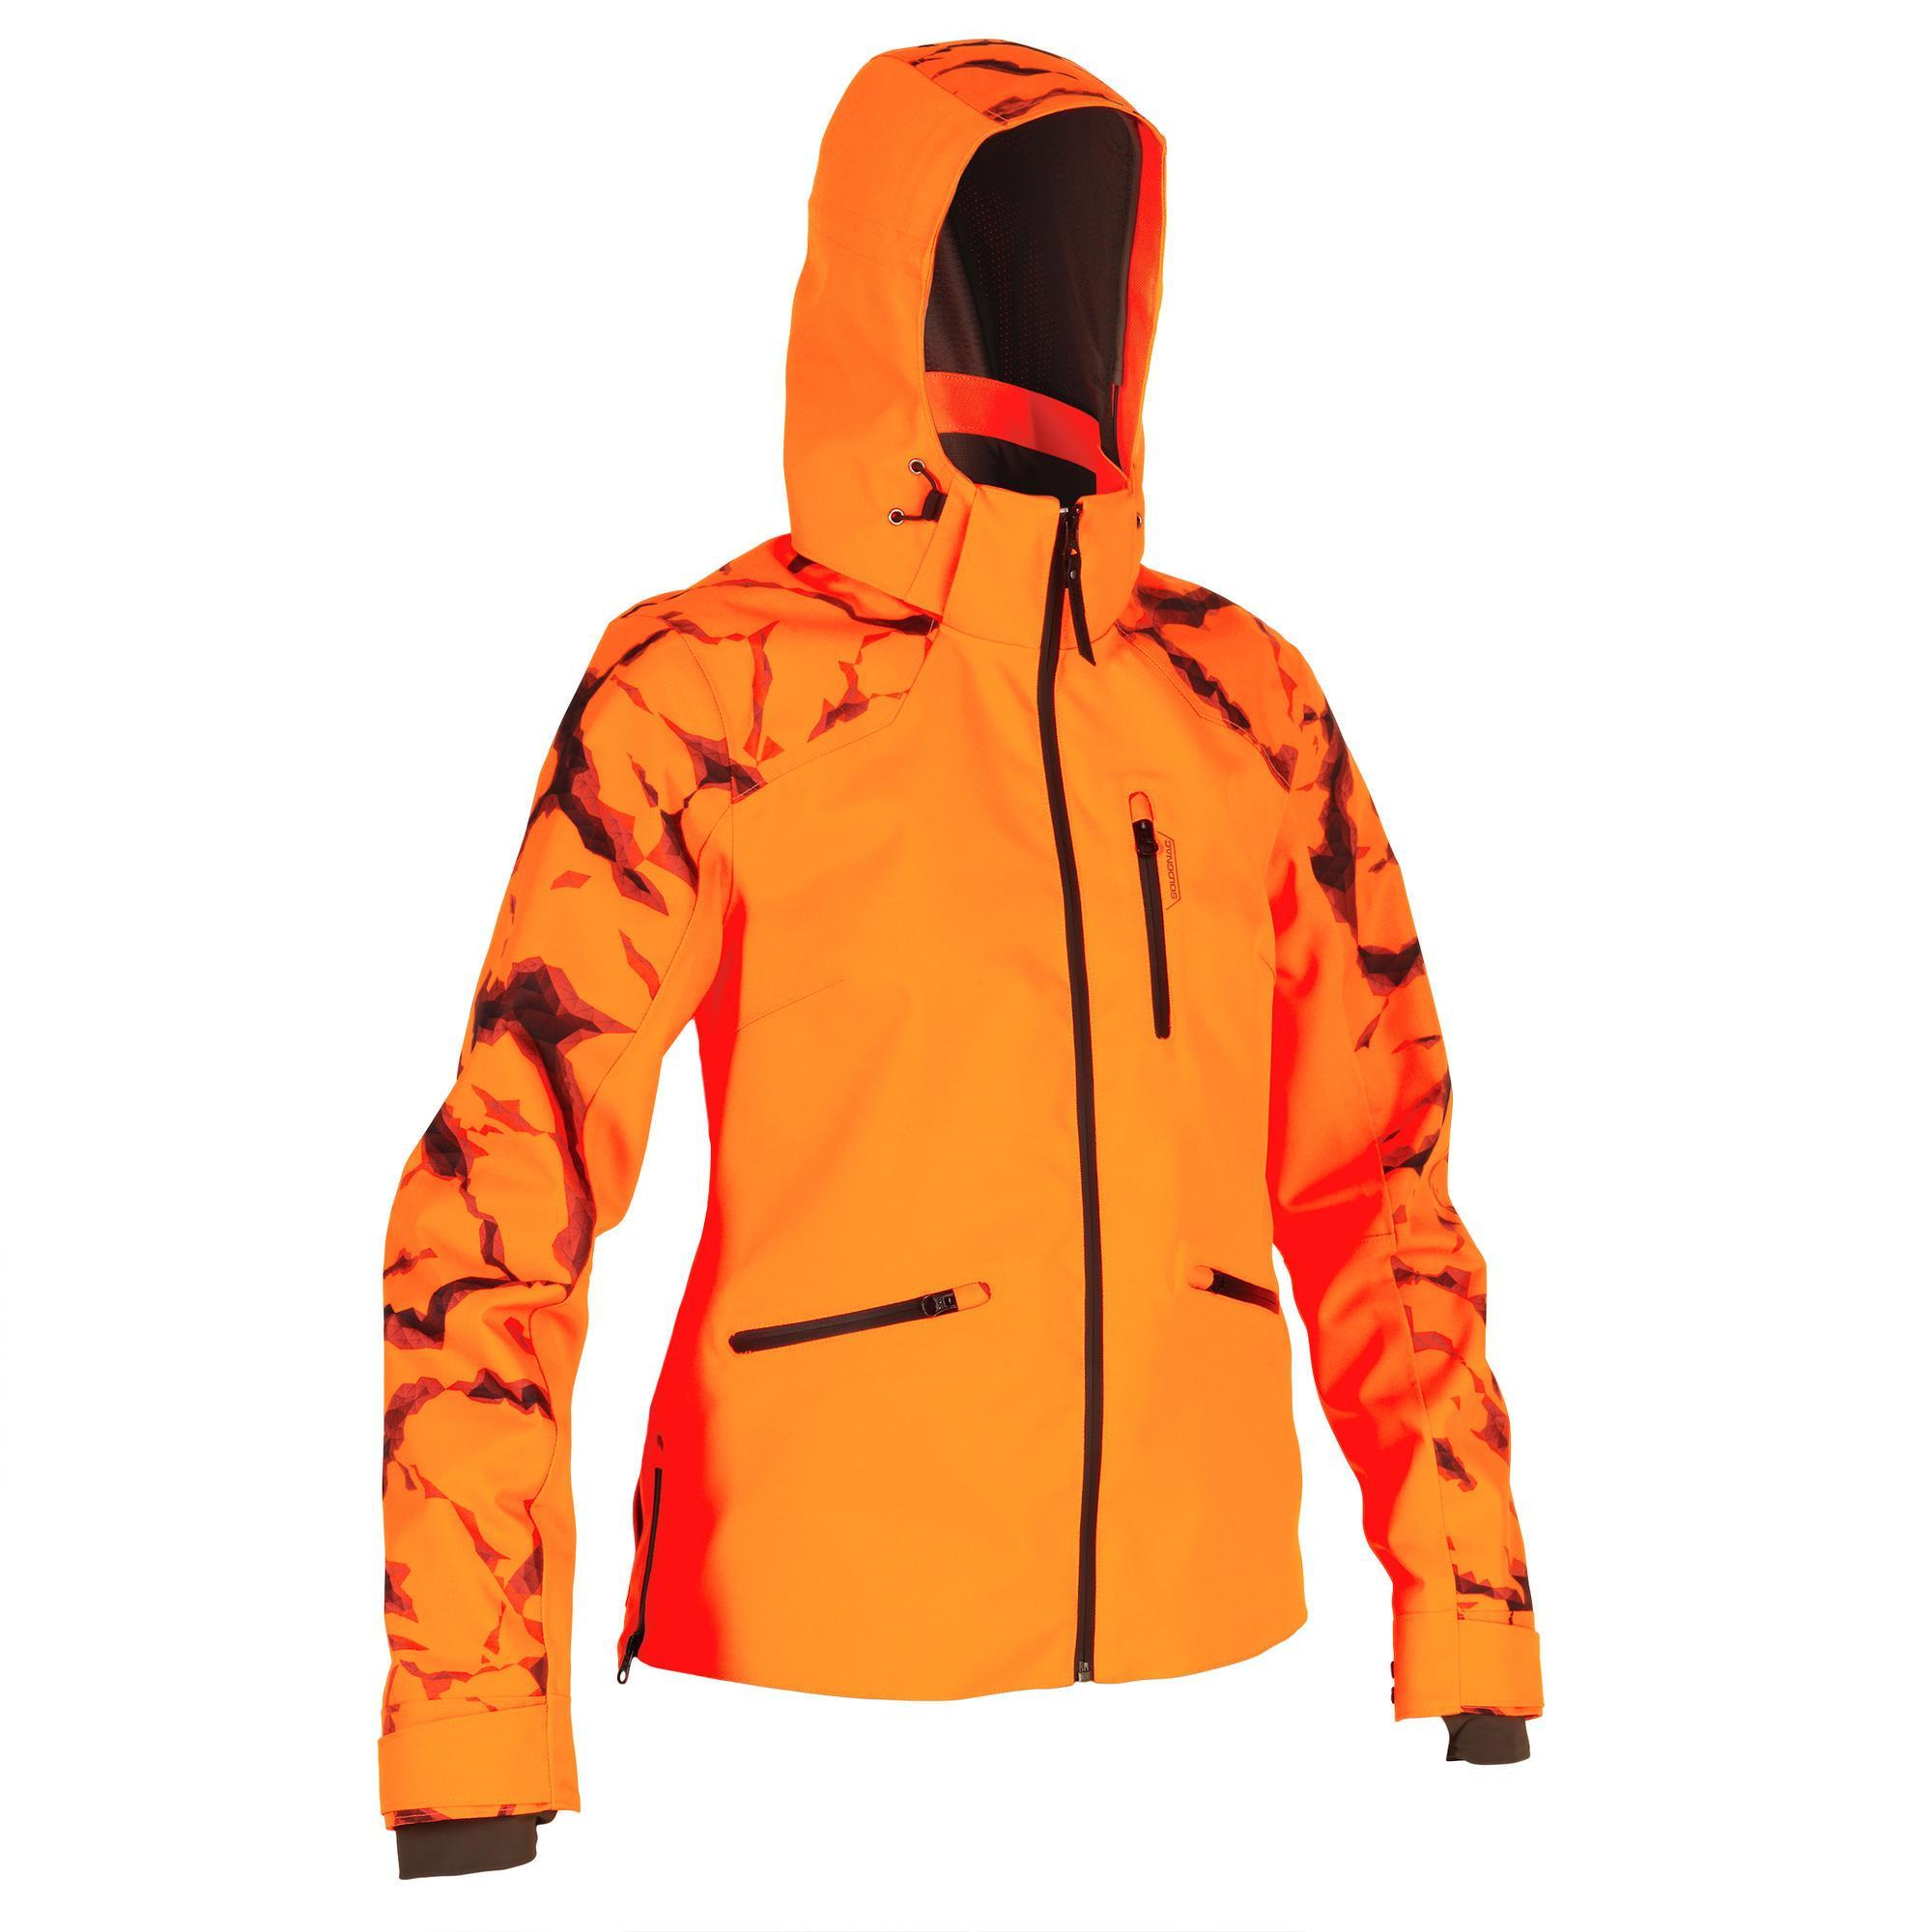 Jagd-Regenjacke Supertrack orange   Sportbekleidung > Sportjacken > Regenjacken   Solognac